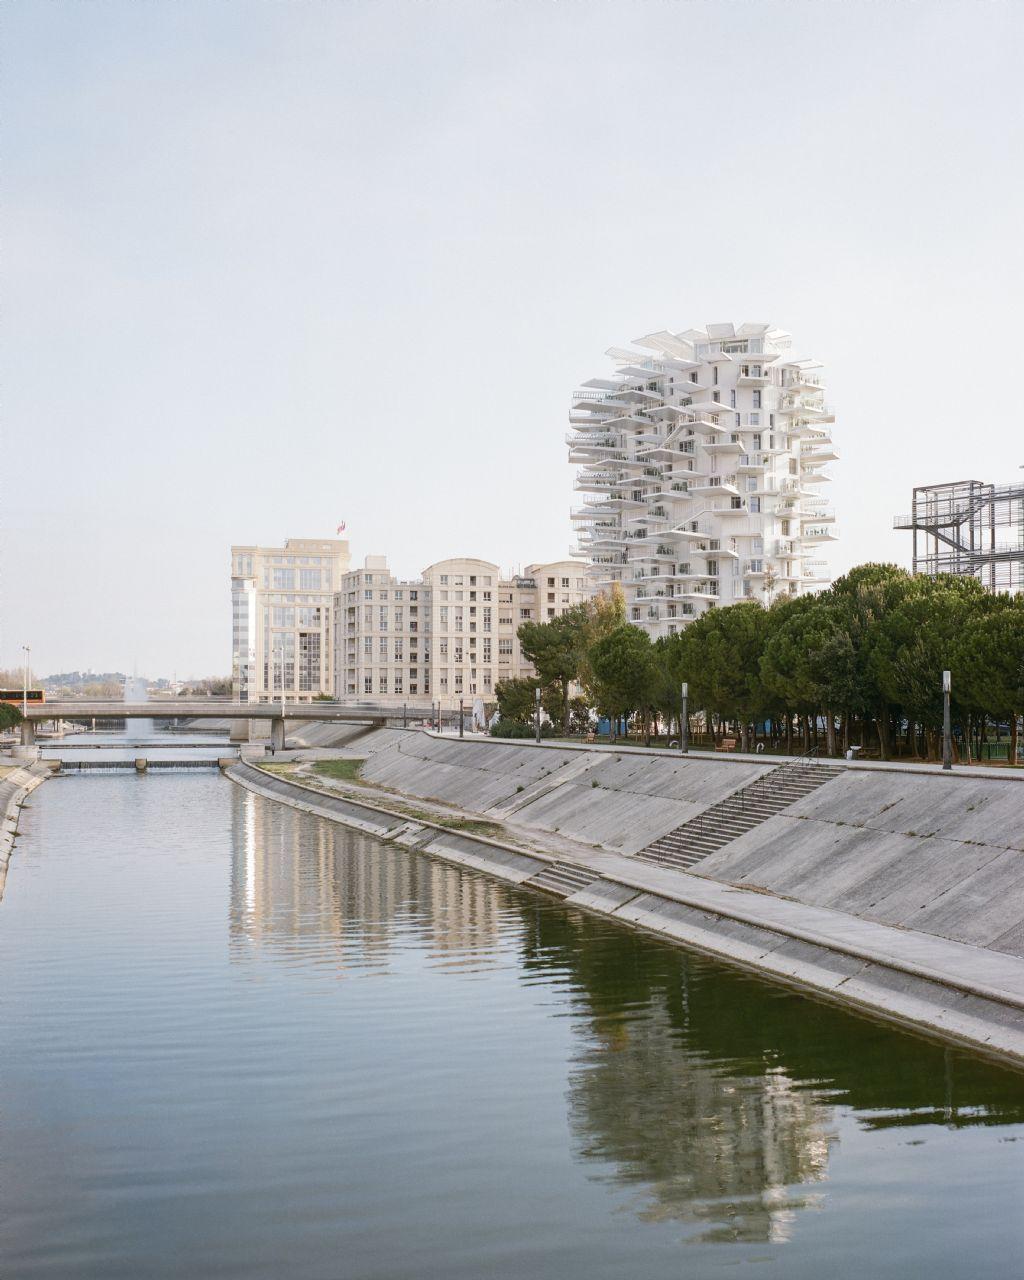 L'Arbre Blanc van Sou Fujimoto in Montpellier